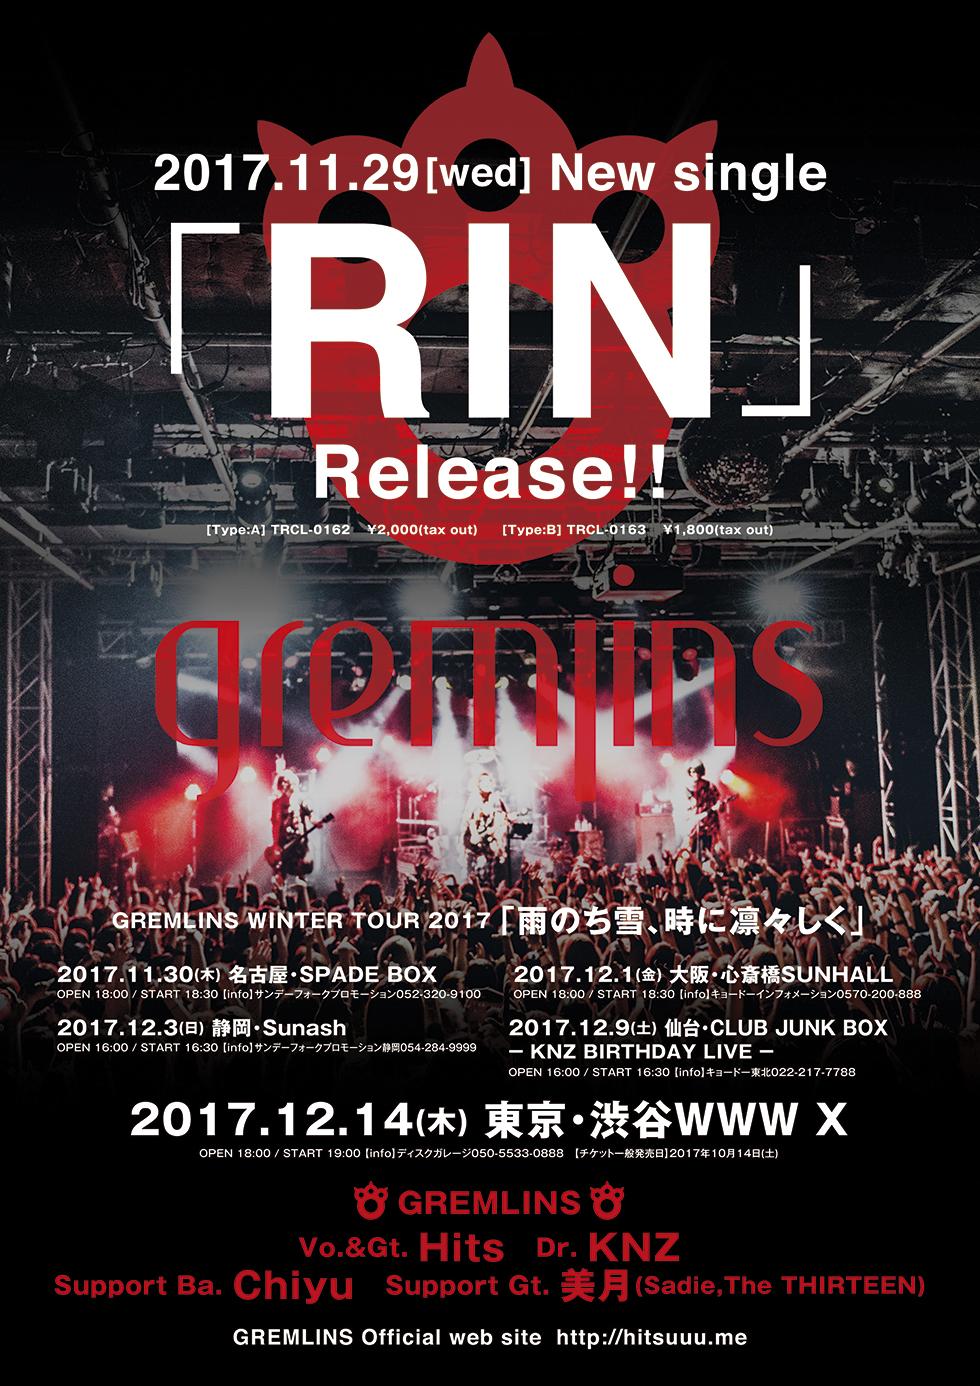 http://hitsuuu.me/GR_201709_RIN_A4.jpg